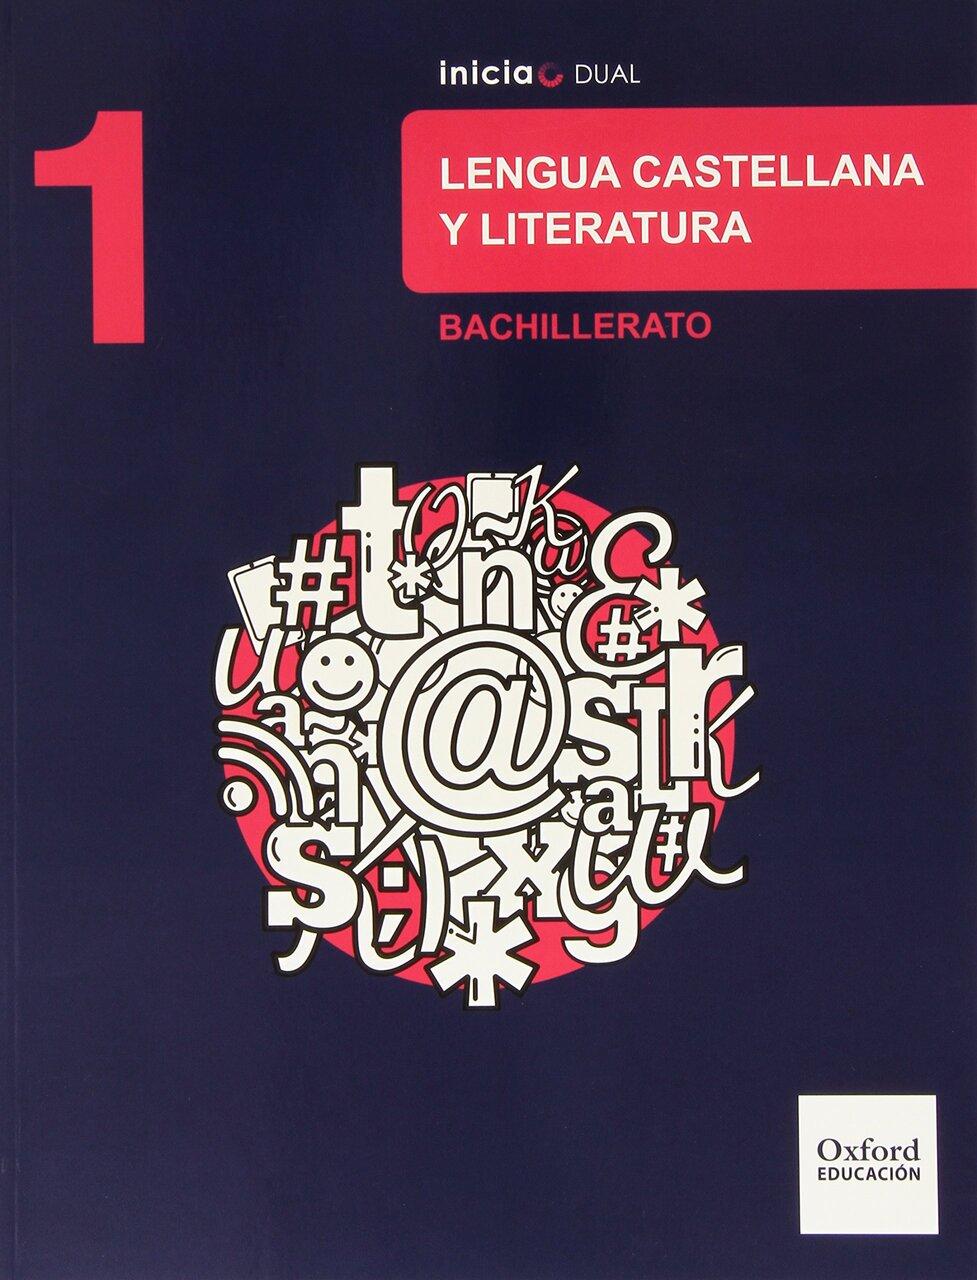 Solucionario Lengua y Literatura 1 Bachillerato Oxford